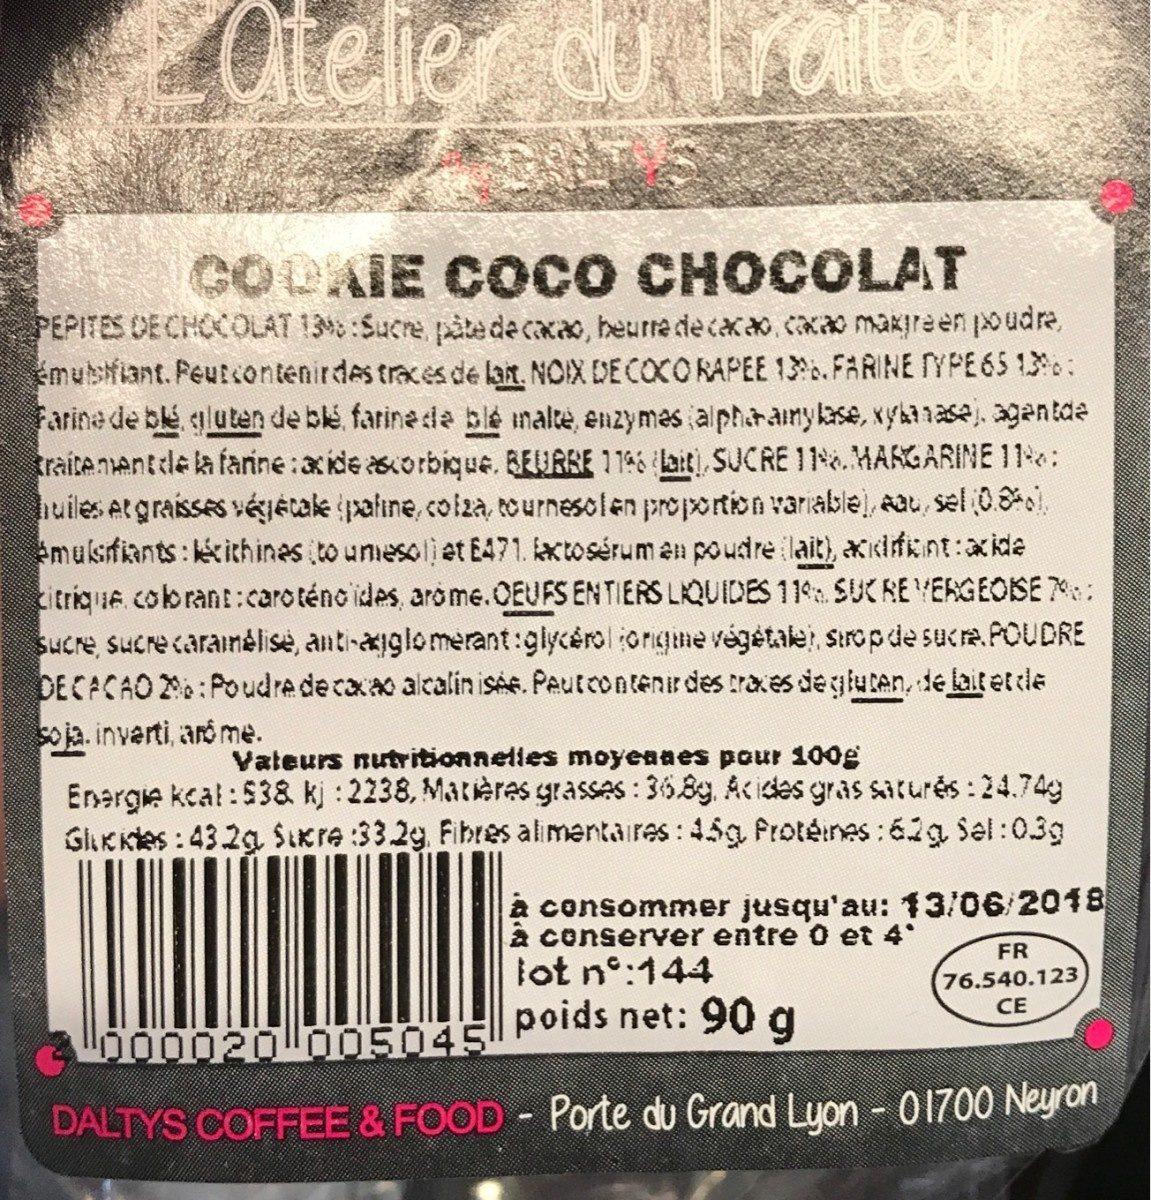 Cookie coco chocolat - Produit